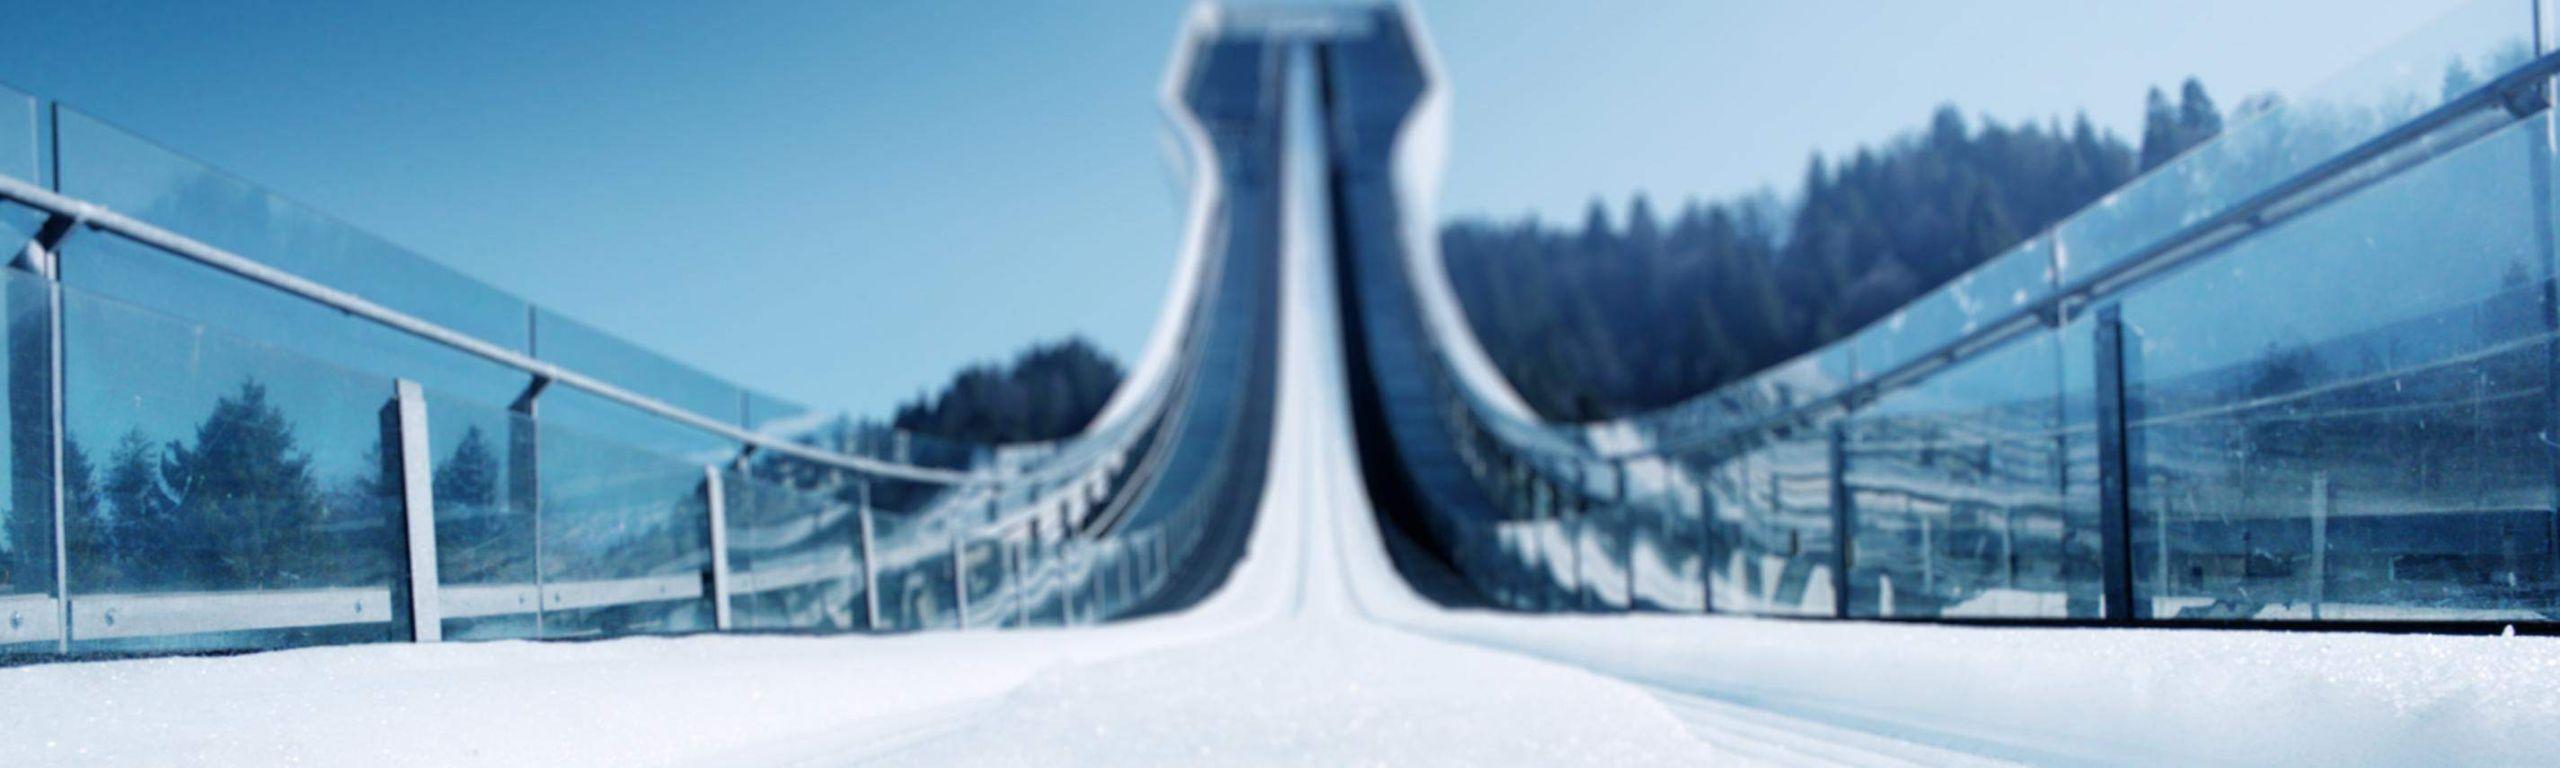 skispringen 184 2850x855